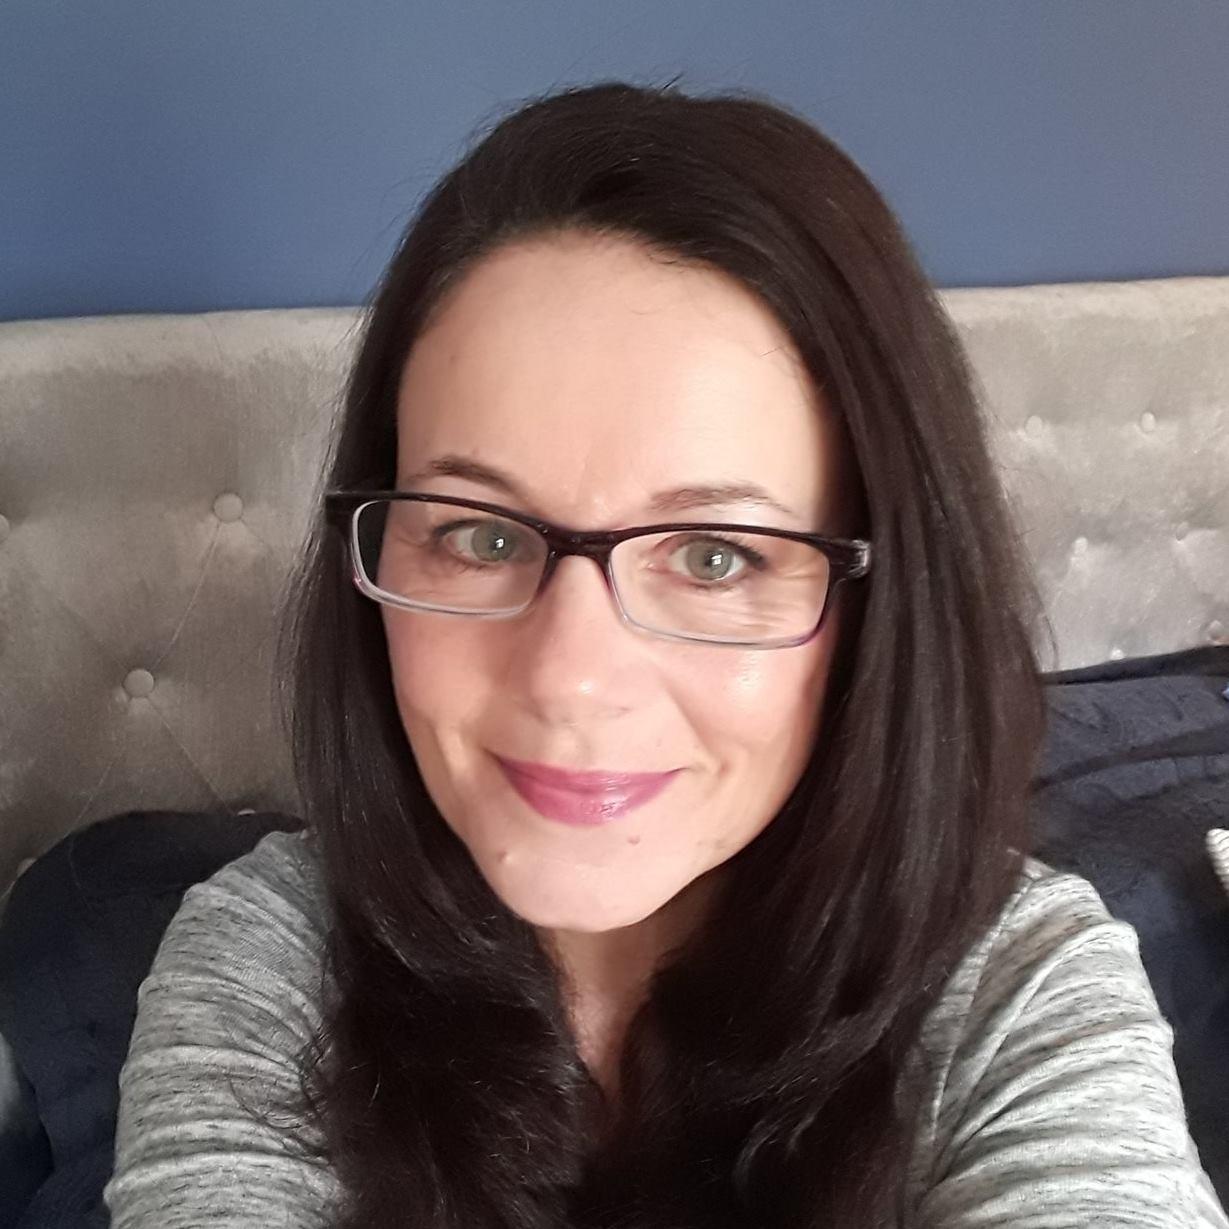 Adrienne Hodges - Freelance Web Designer - dark hair, glasses and a smile